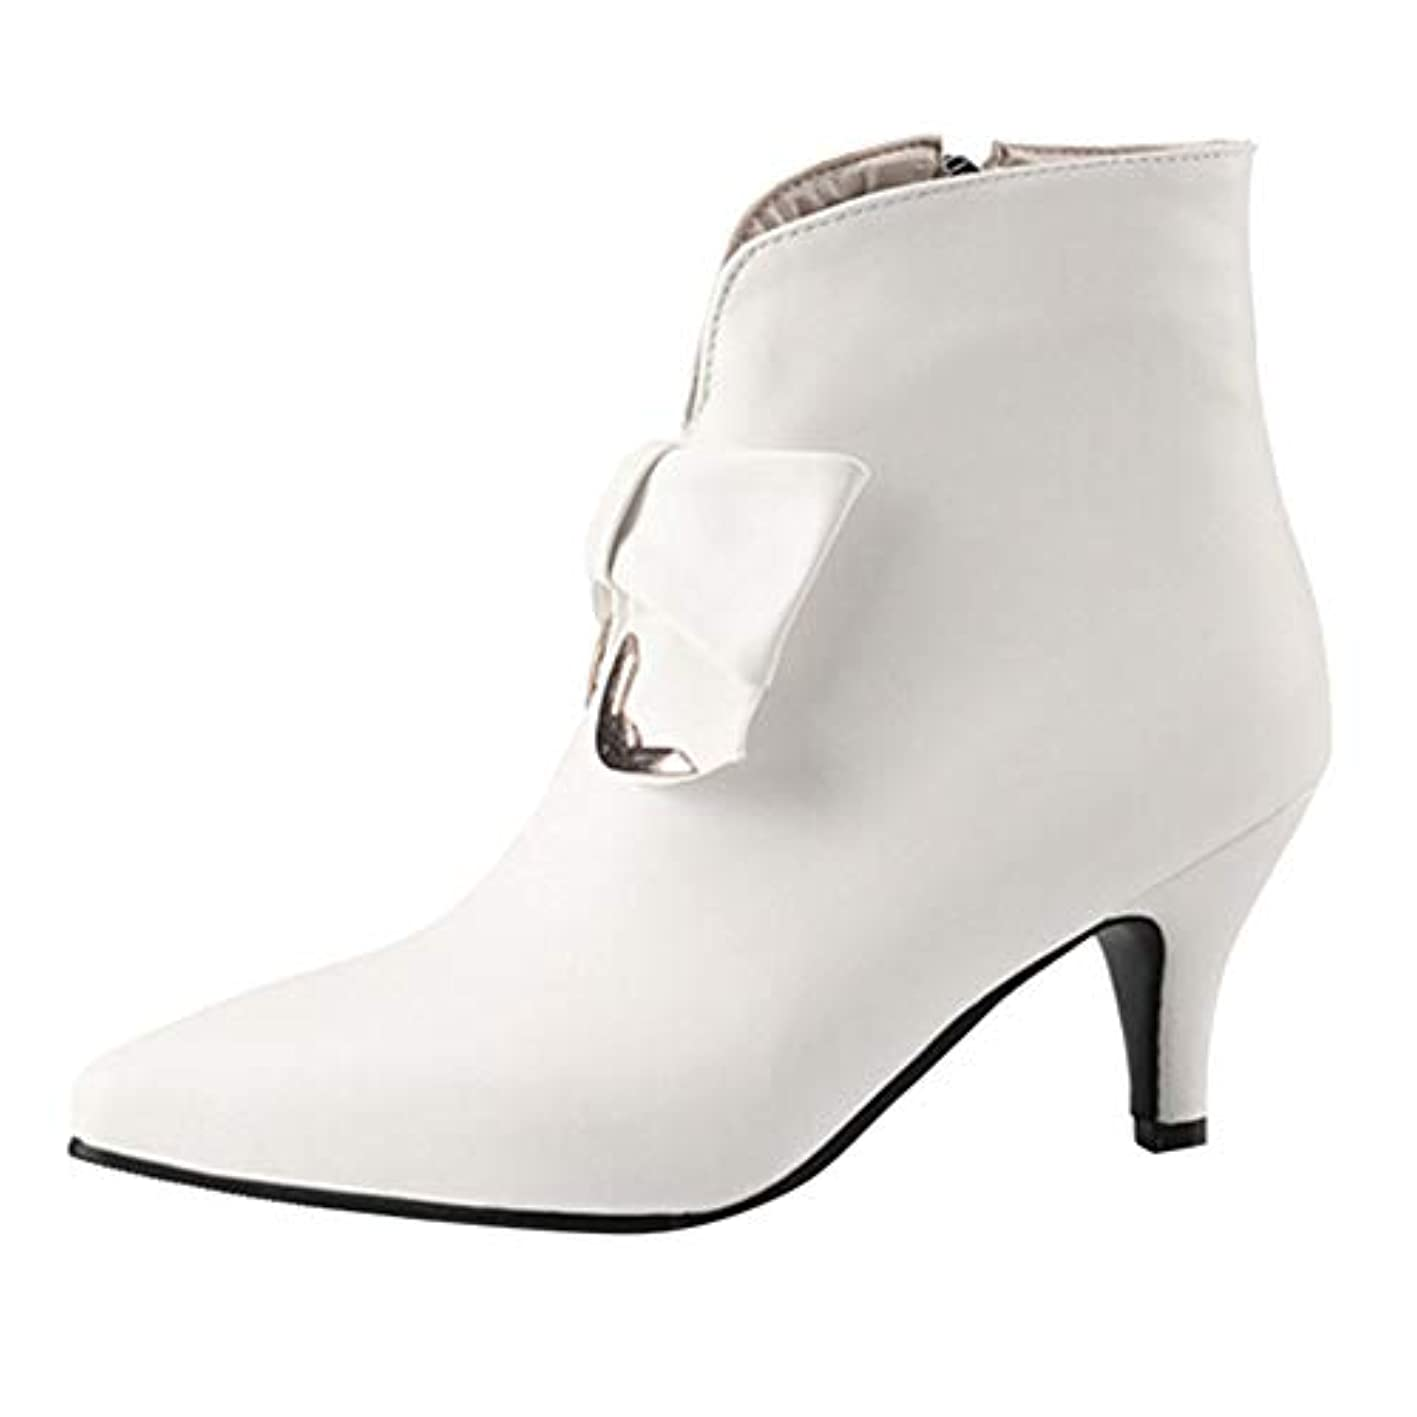 WILLTOO????Women's Pointed Butterfly-Knot Zipper Thin Heels Ankle Boots ukcxpbirjmr597